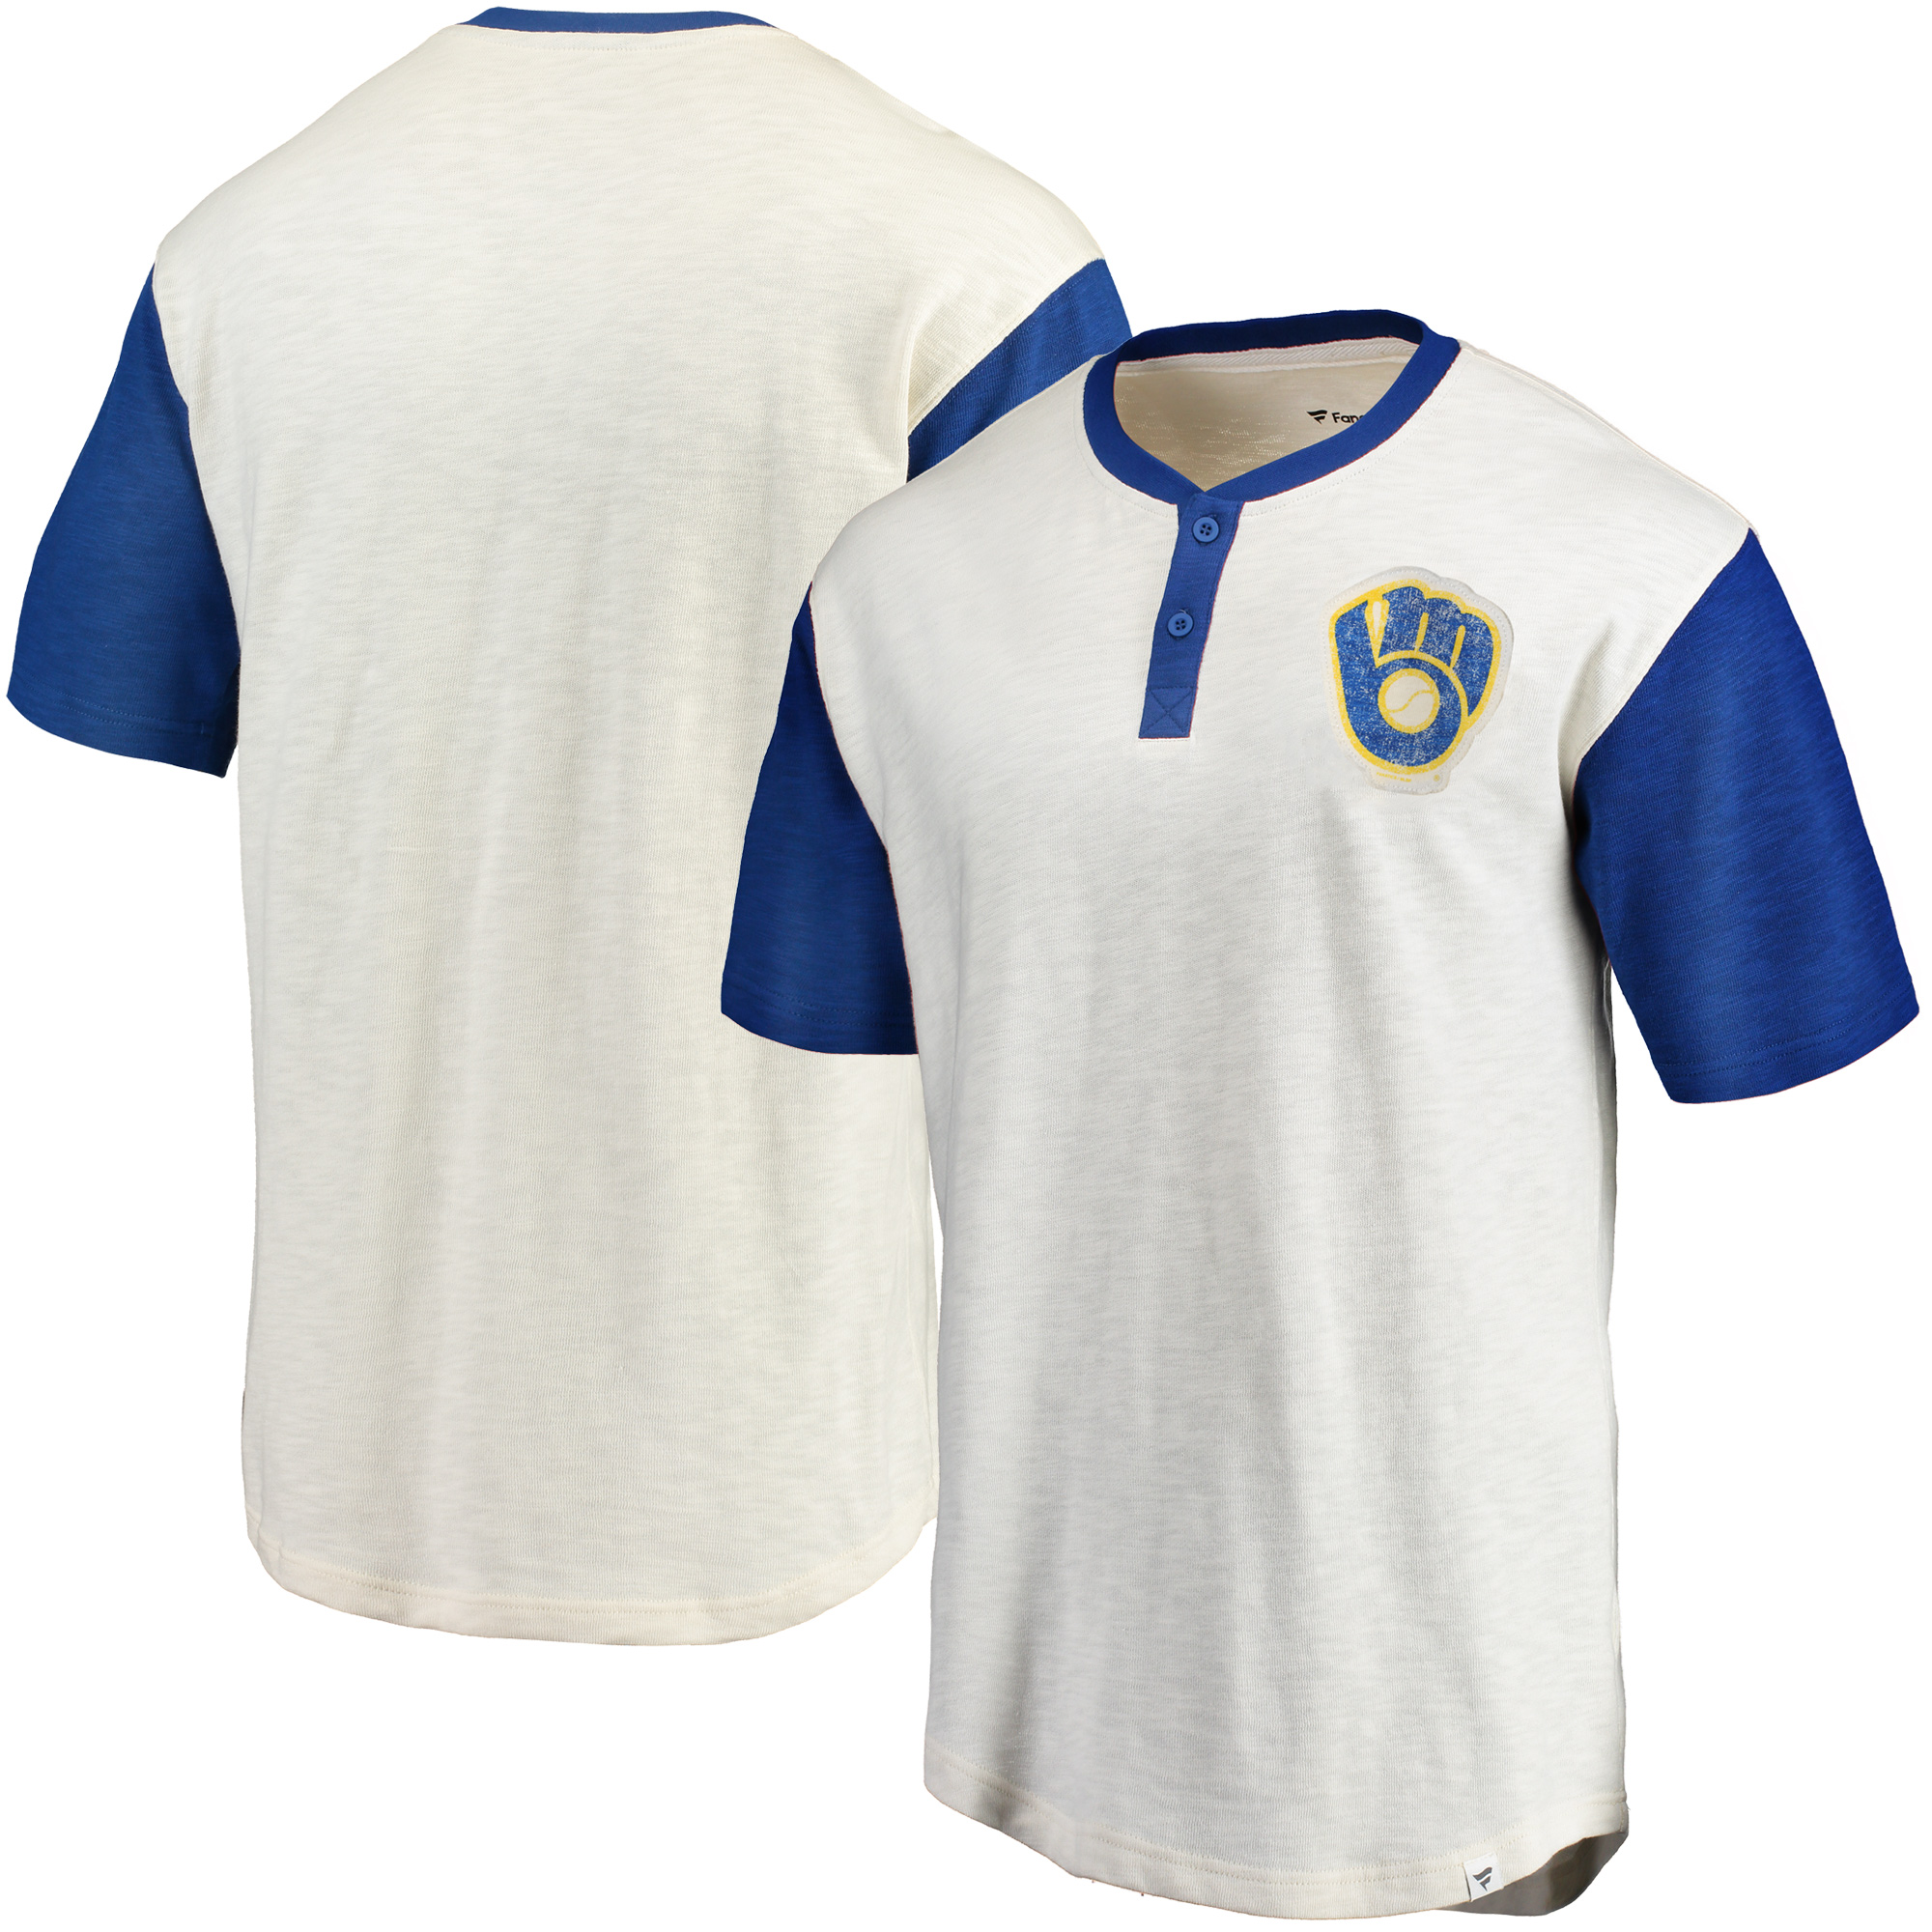 Milwaukee Brewers Fanatics Branded True Classics Henley T-Shirt - Cream/Royal